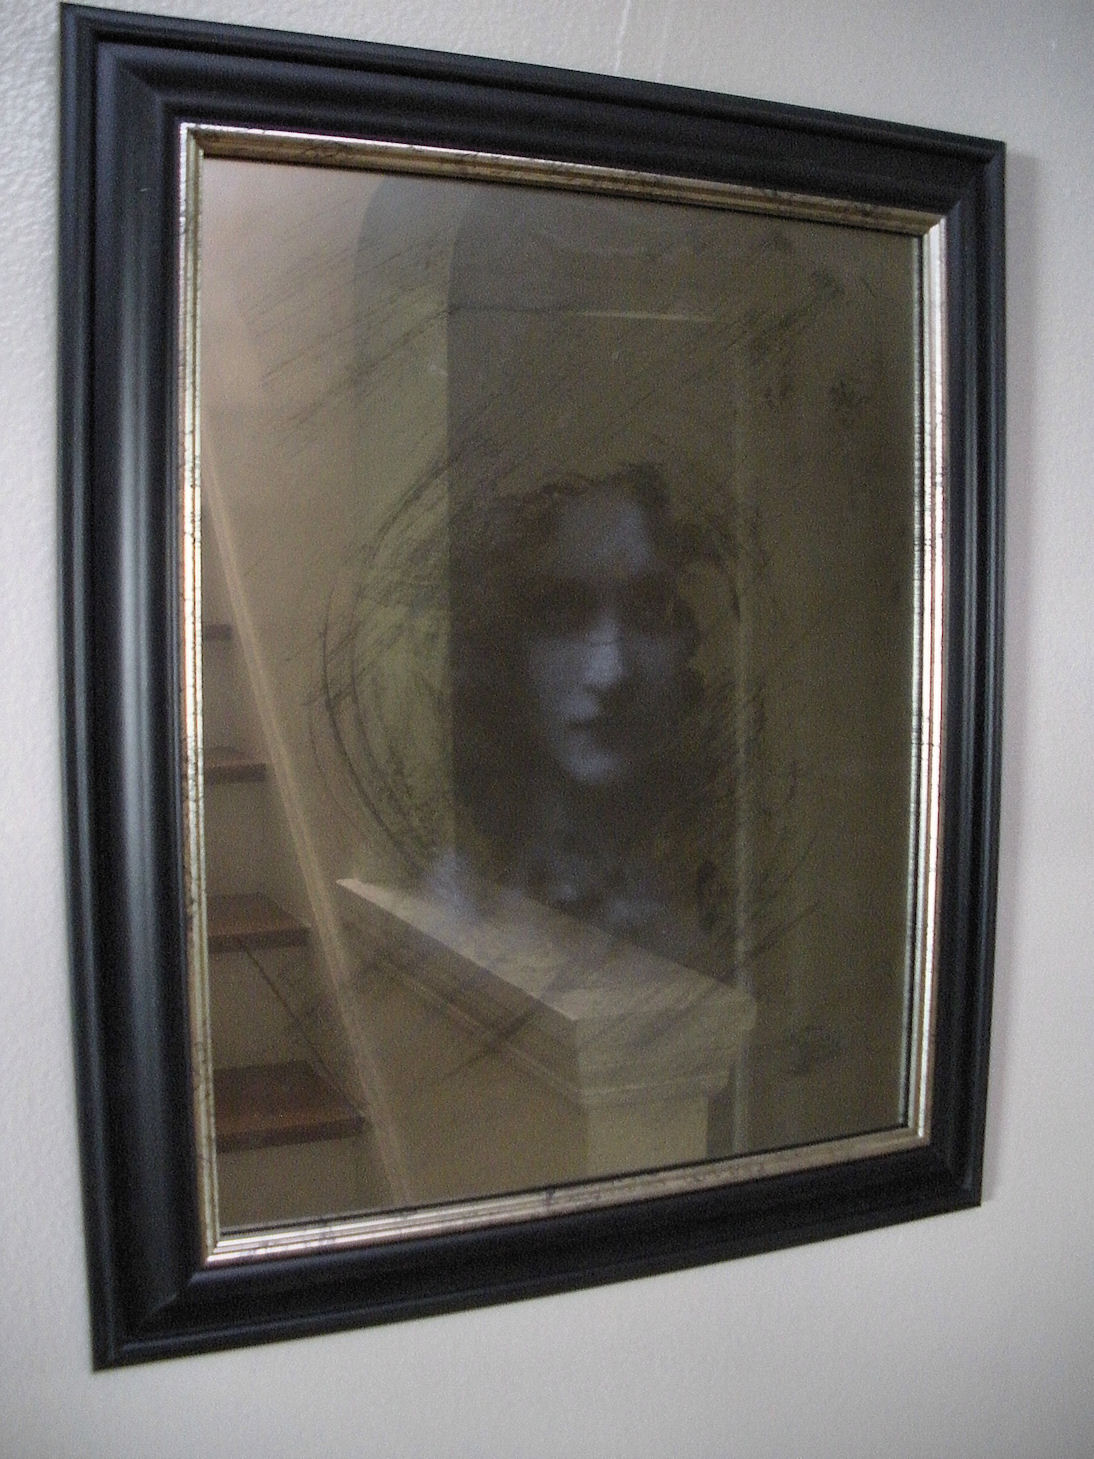 Domythic Bliss: A Creeptastically Eerie Mirror